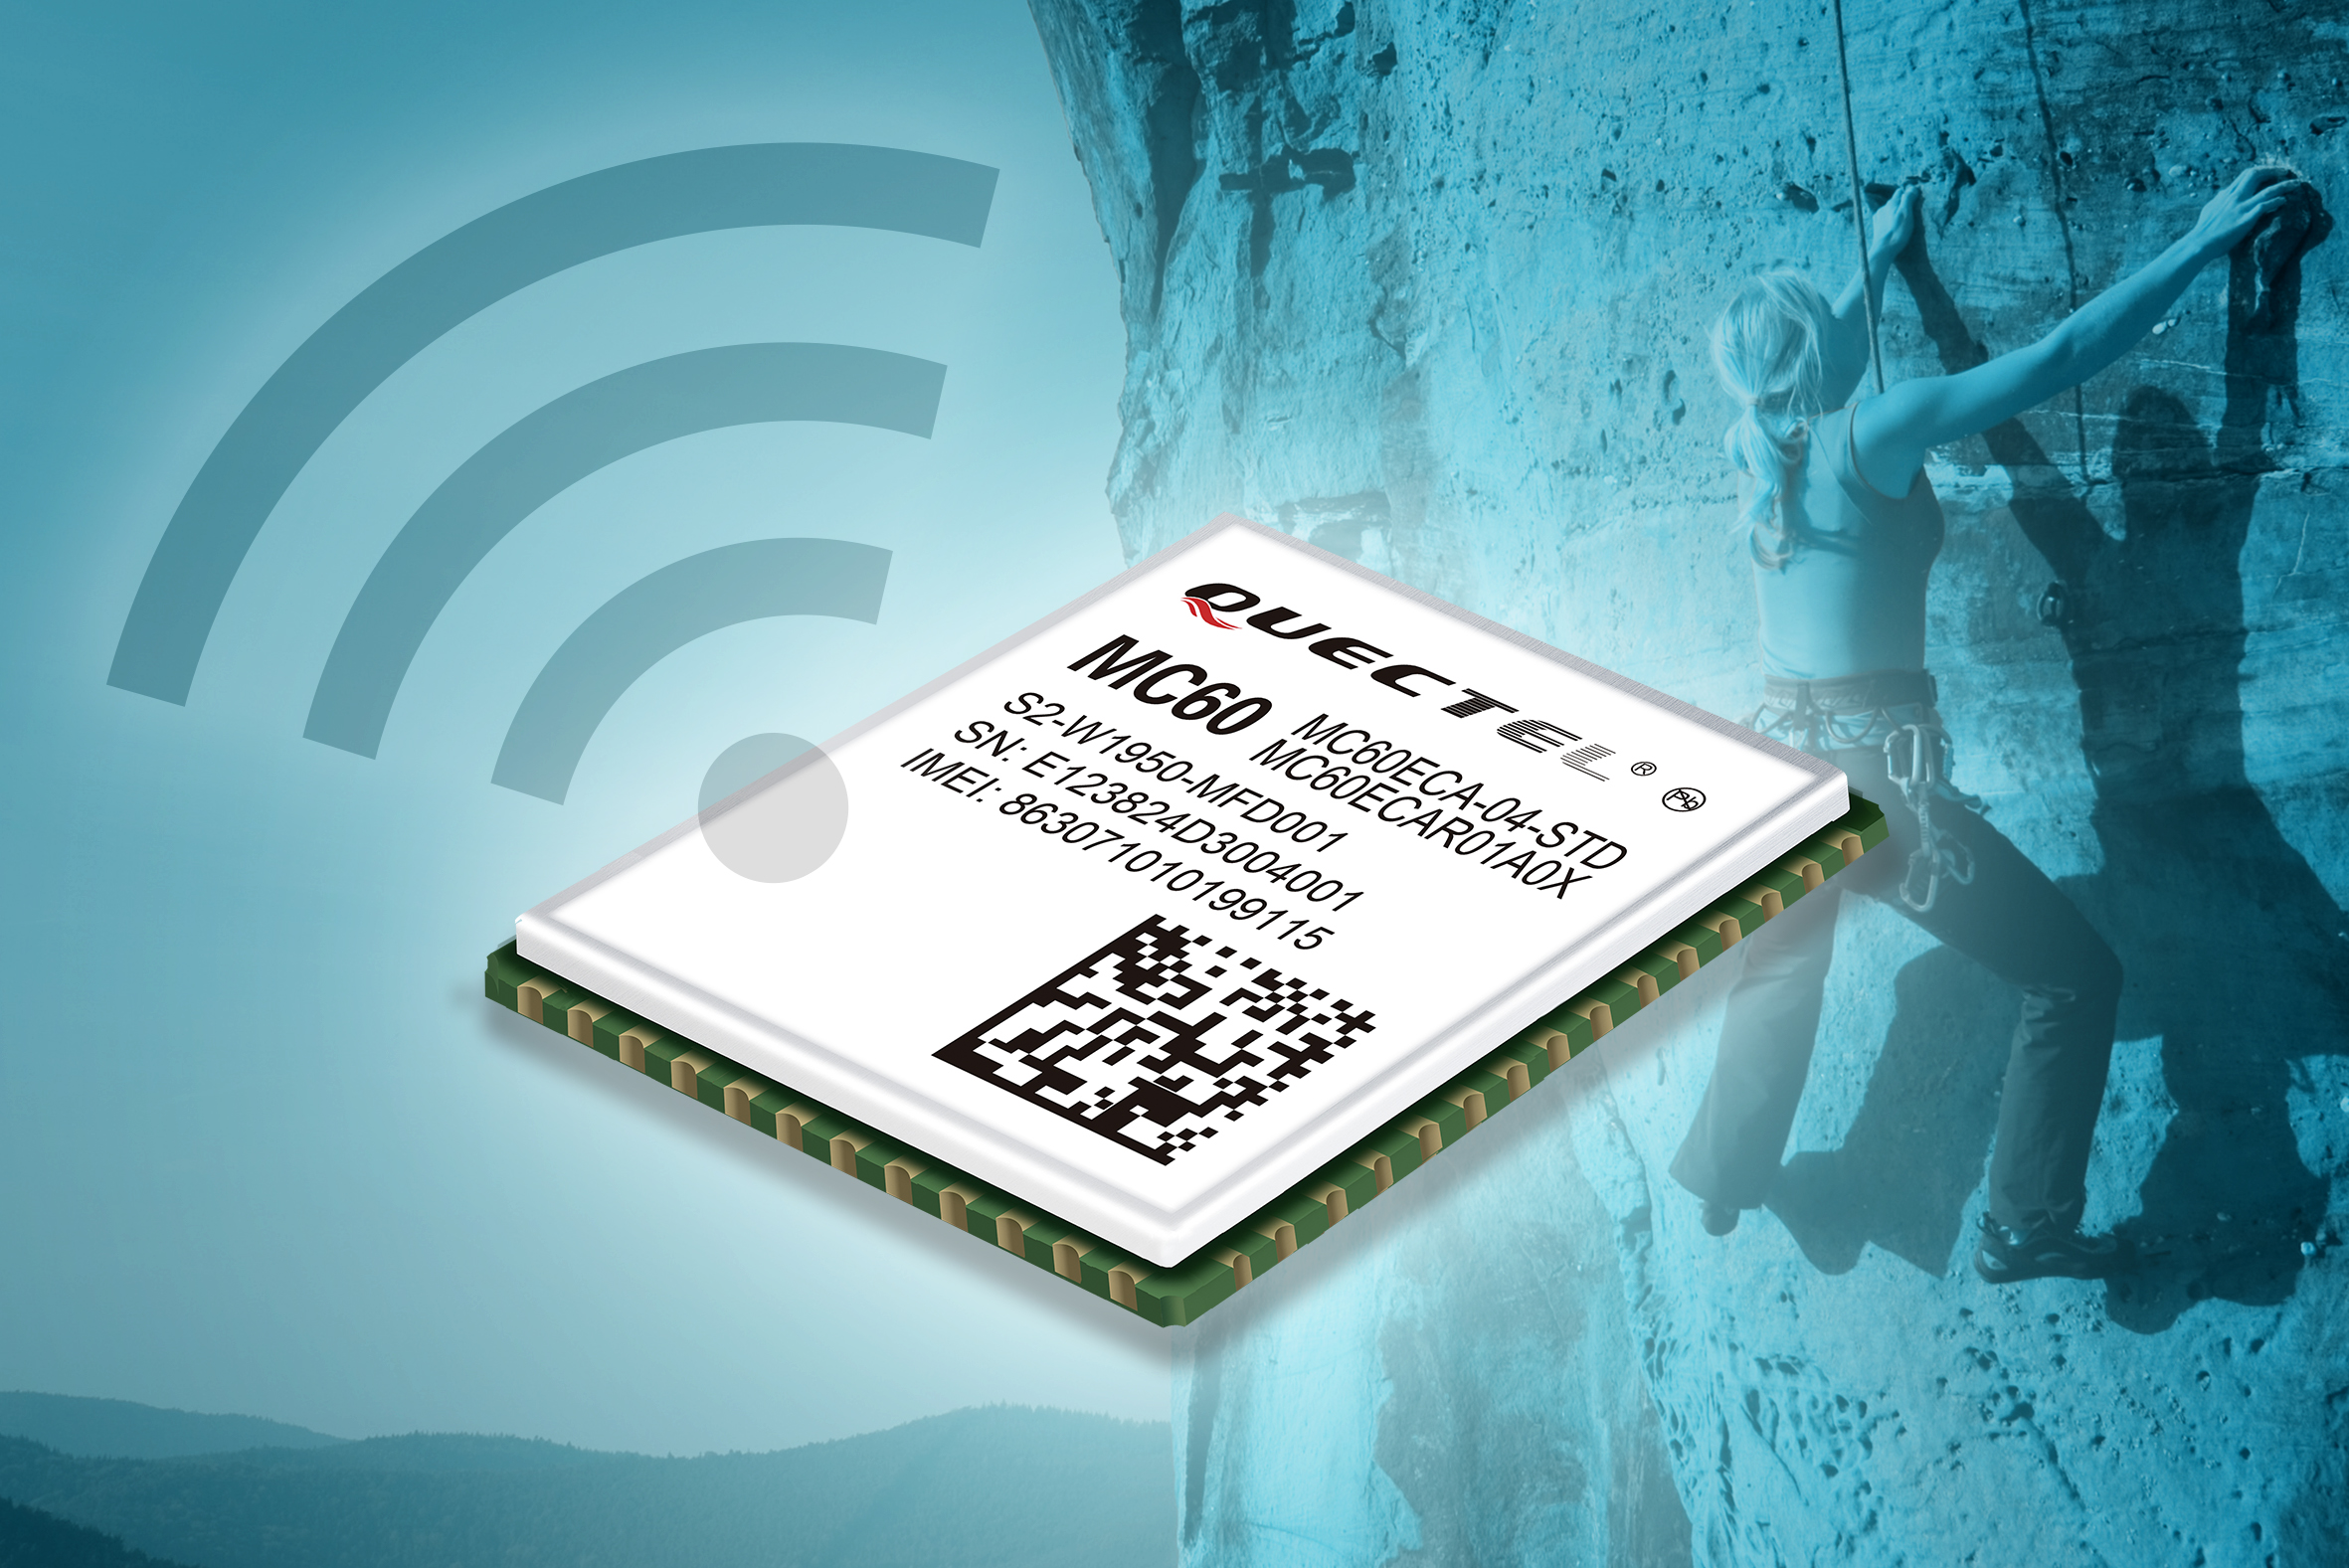 GPRS/GNSS-Kombimodul mit Bluetooth 4.0 dual mode